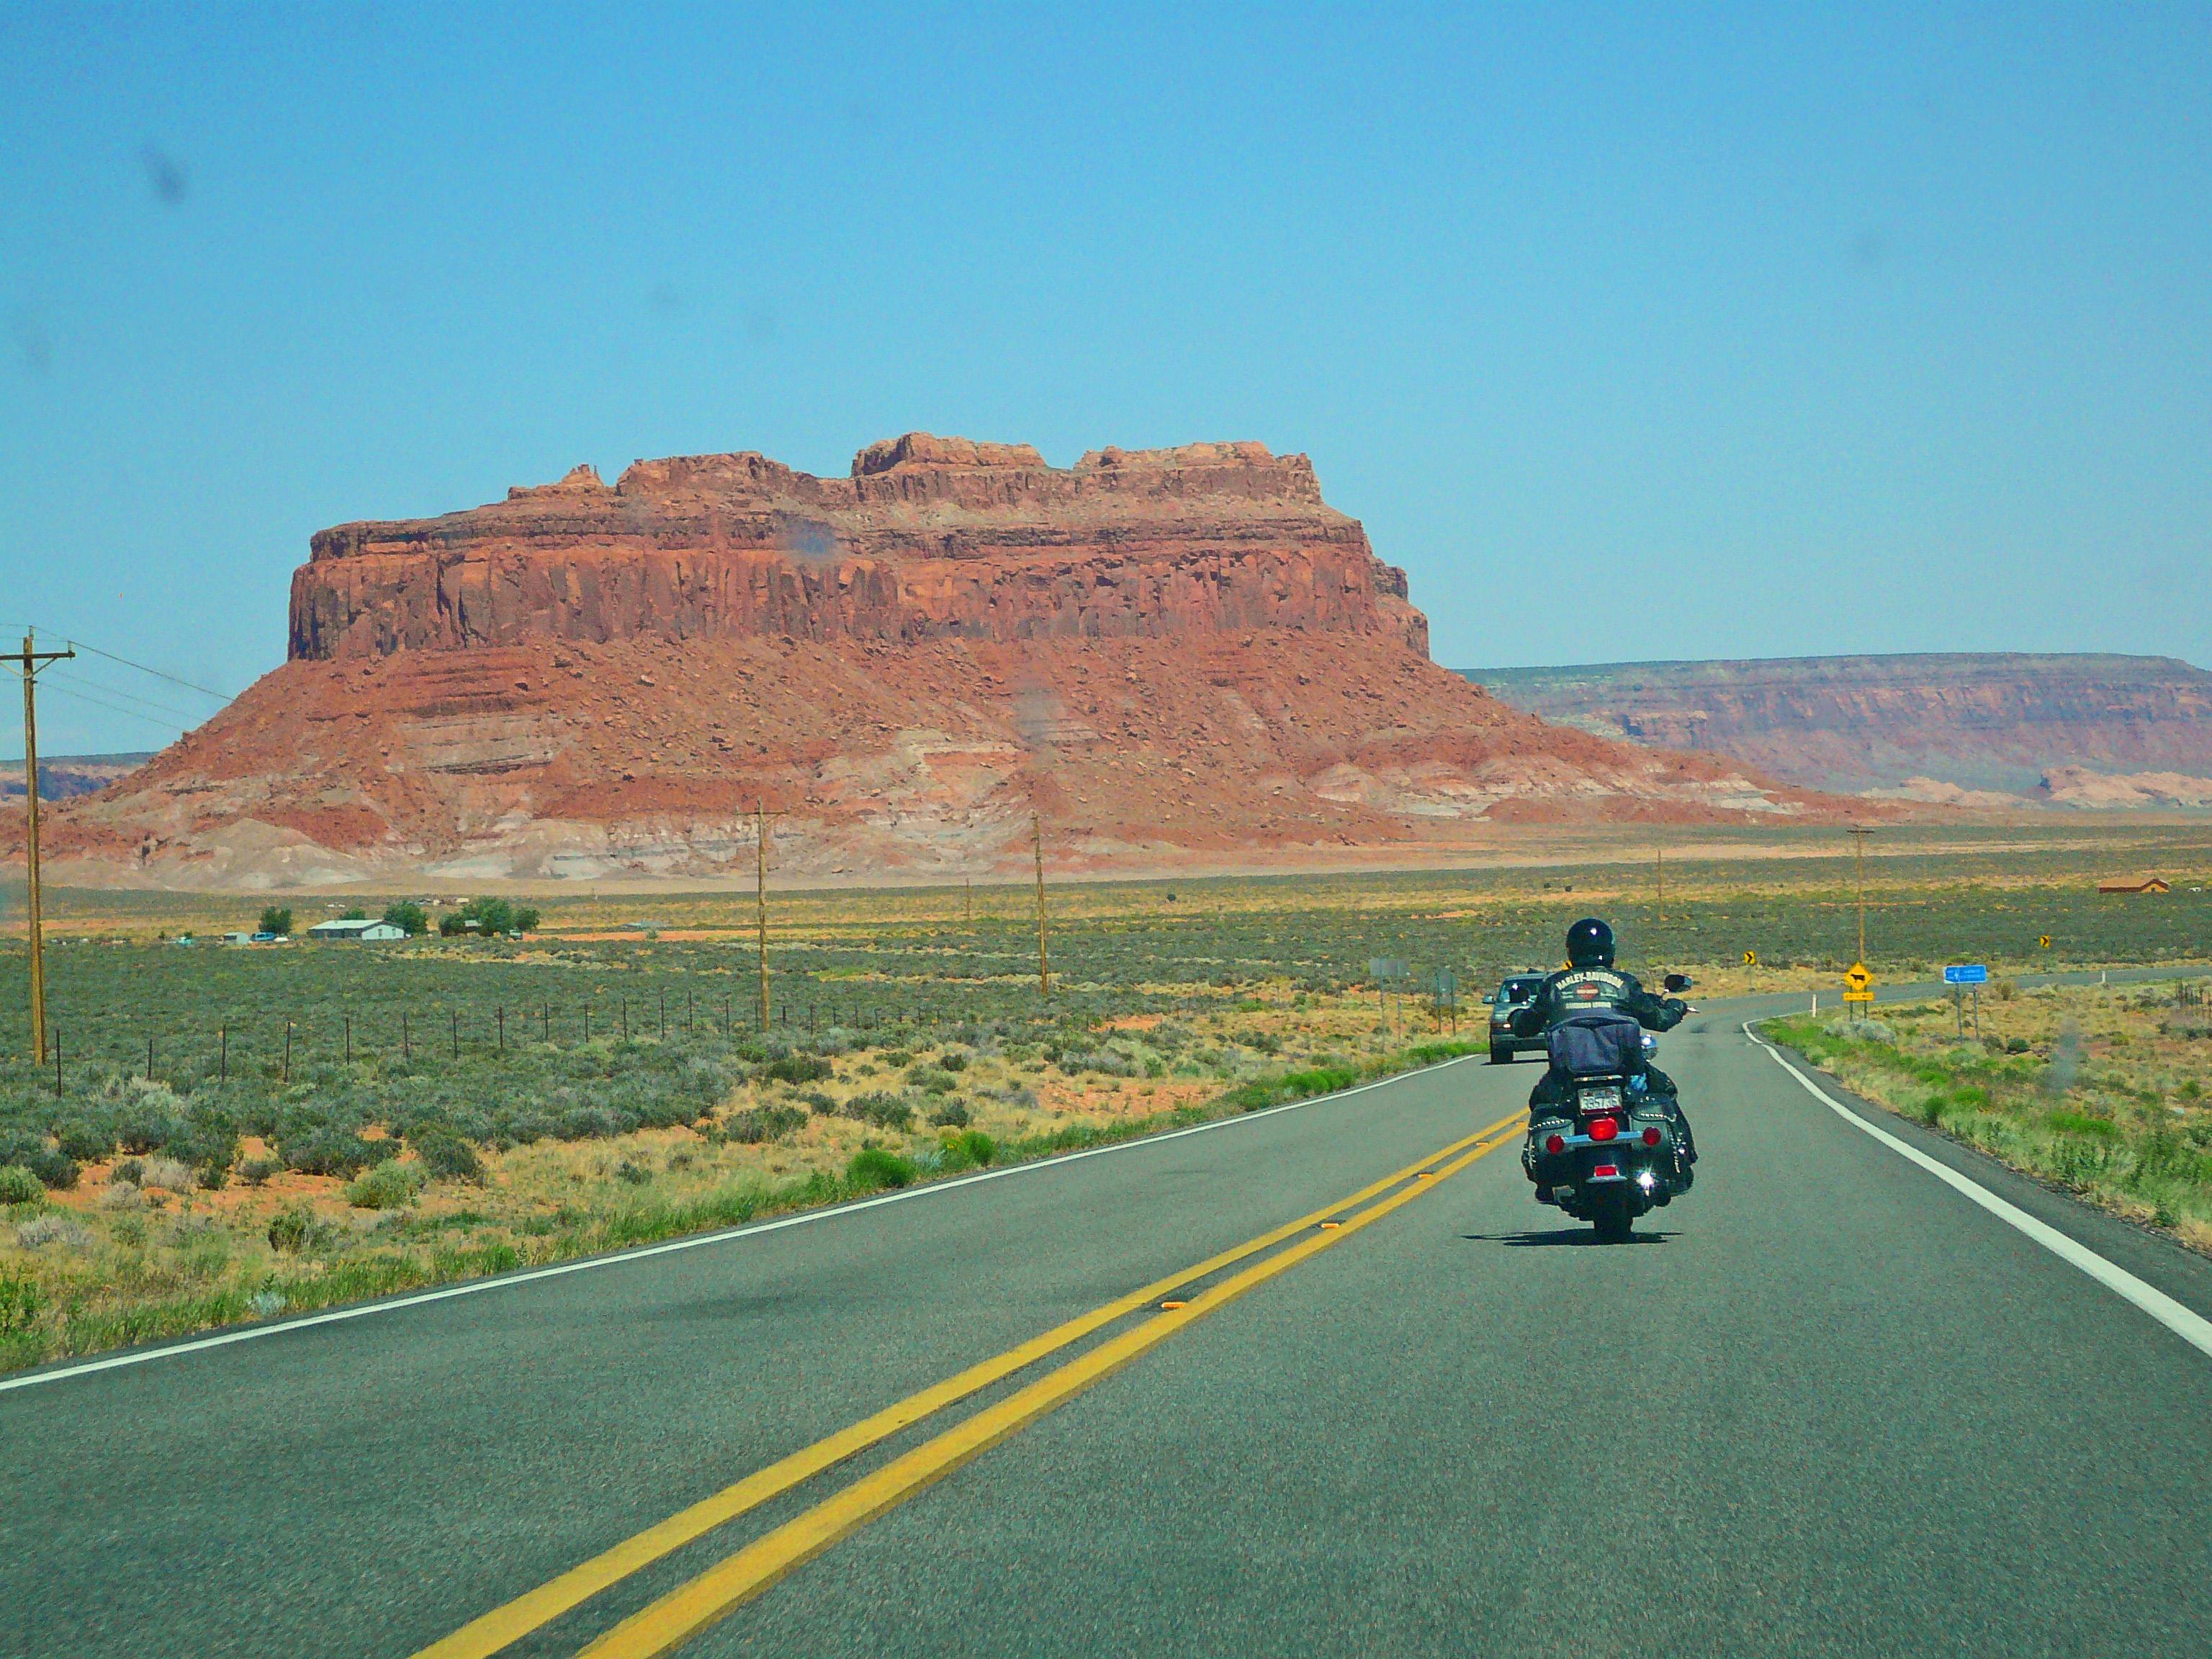 file:harley davidson near monument valley - panoramio